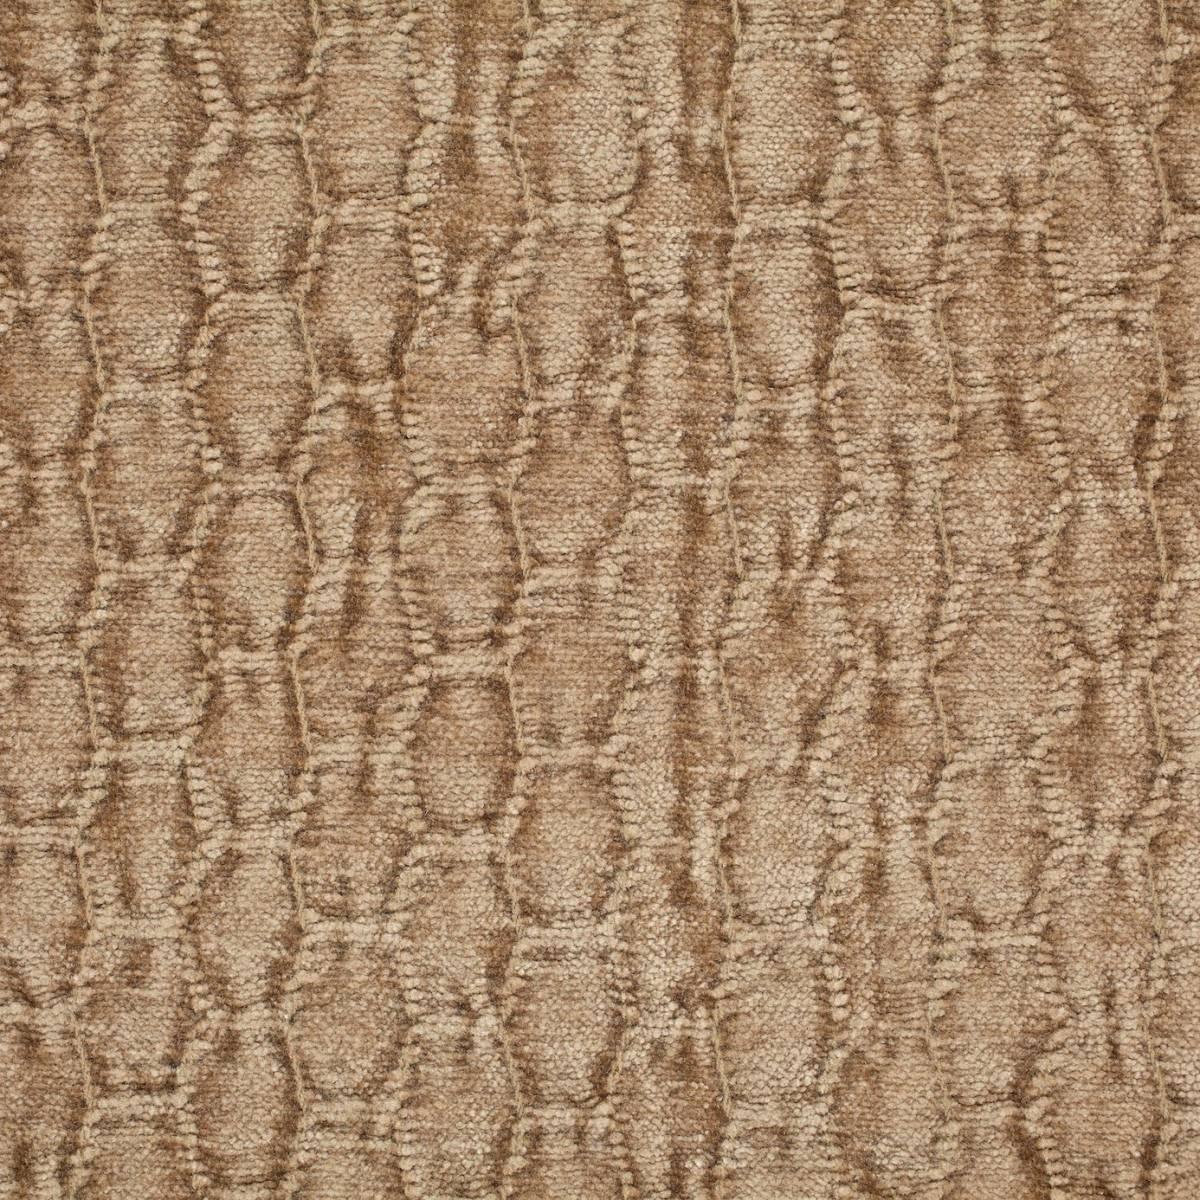 Ashby Fabric Cinammon 331891 Zoffany Haddon Weaves